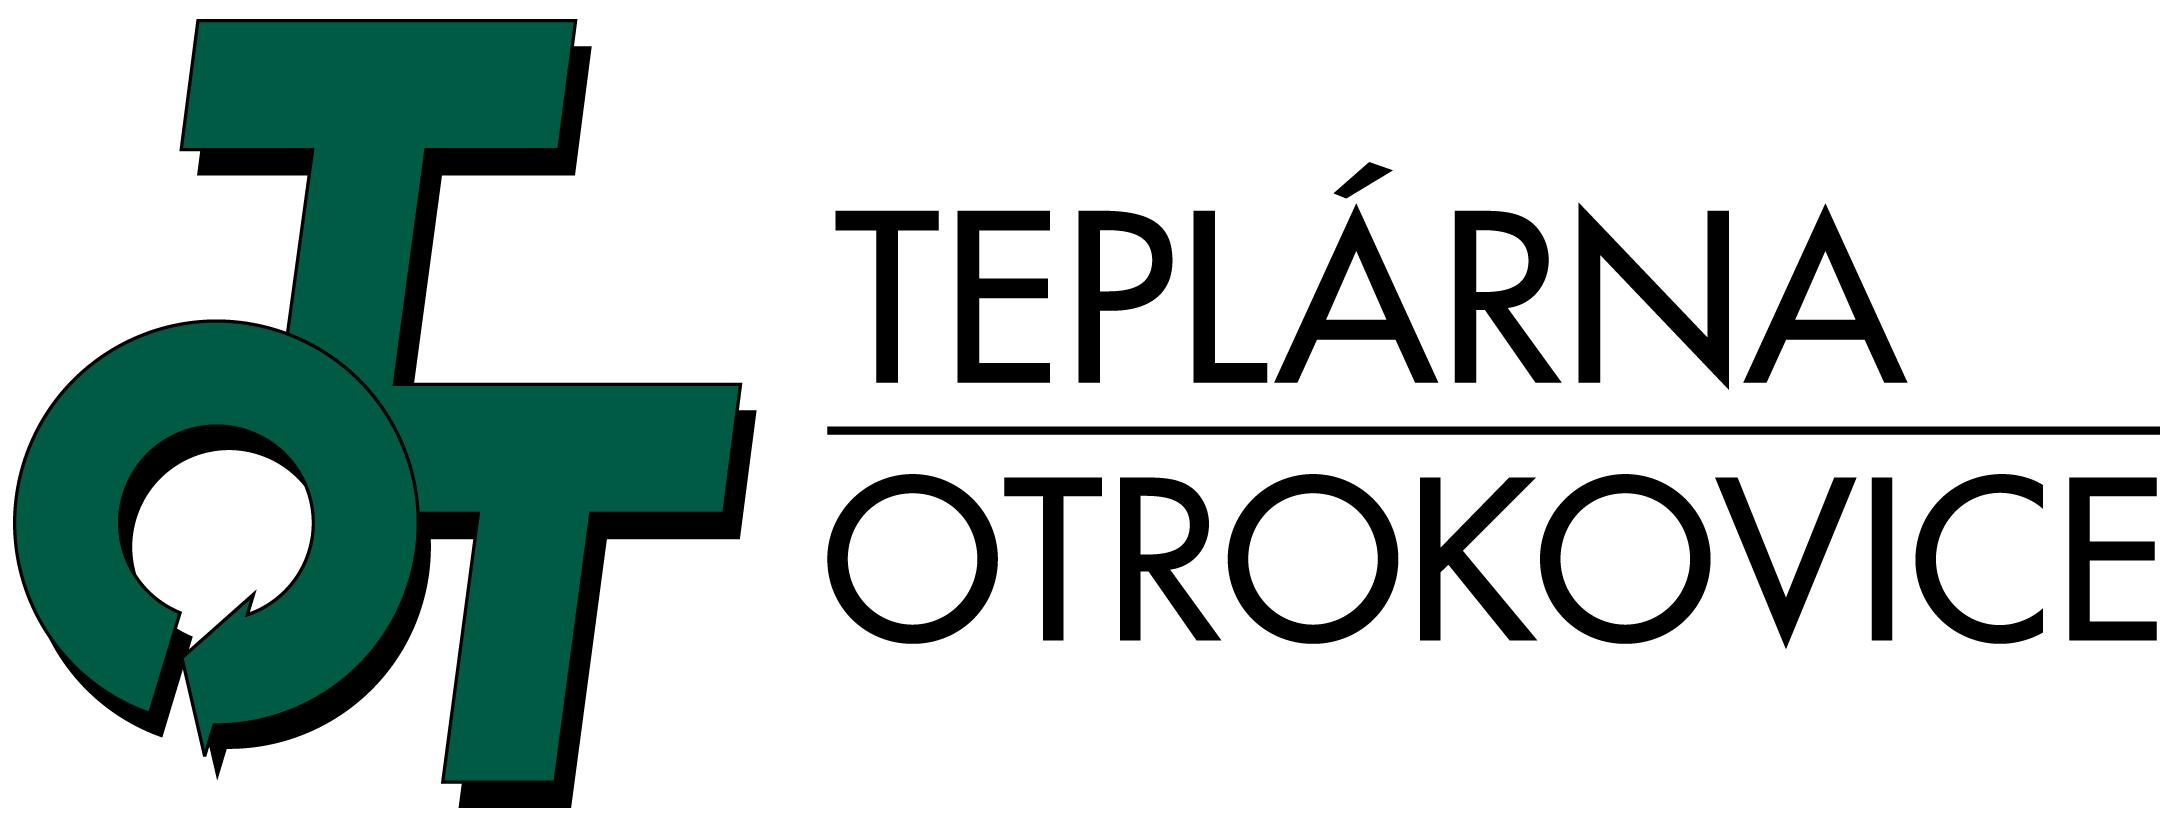 teplárna-1